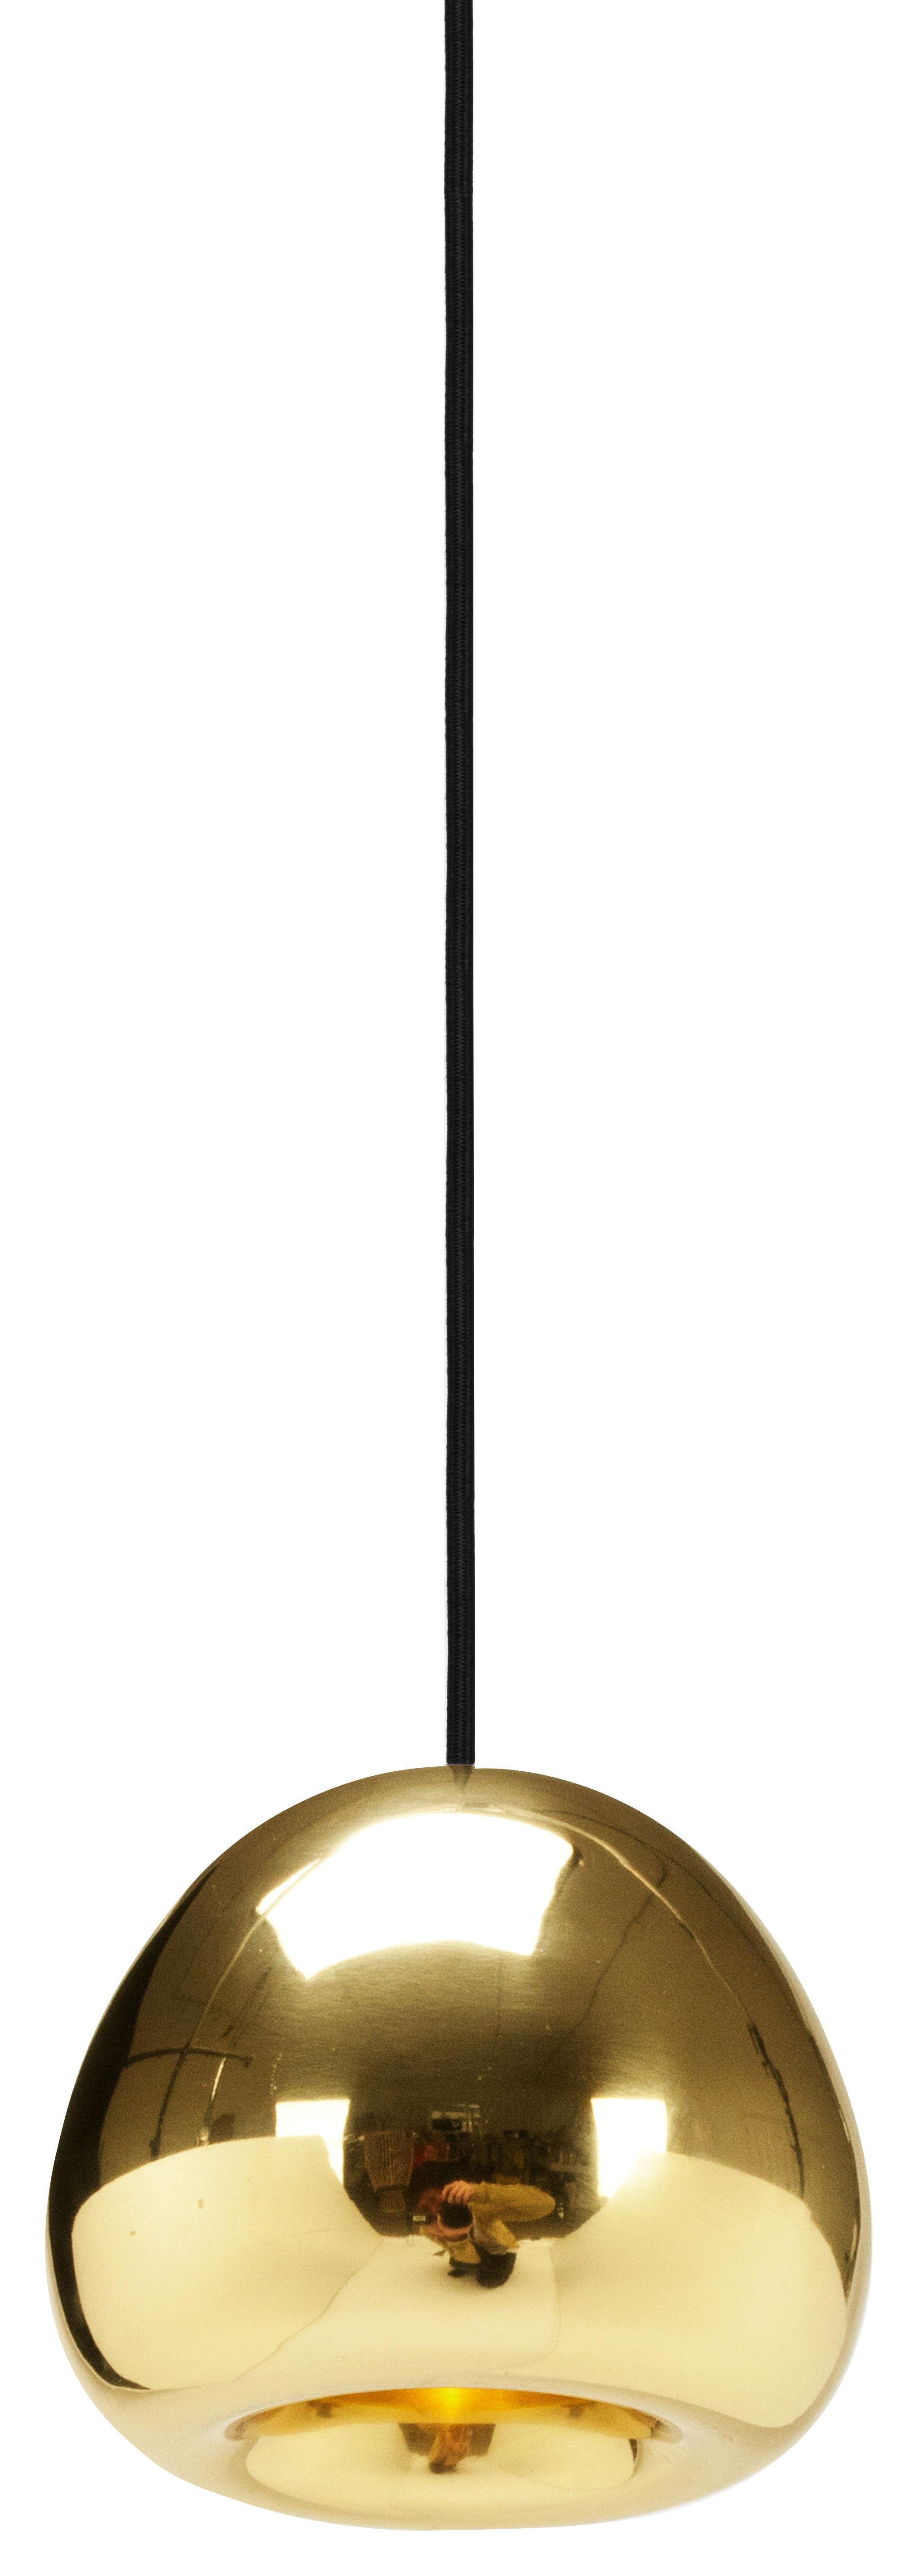 Leuchten - Pendelleuchten - Void Mini Pendelleuchte Ø 15,5 cm - Tom Dixon - Messing - Laiton poli